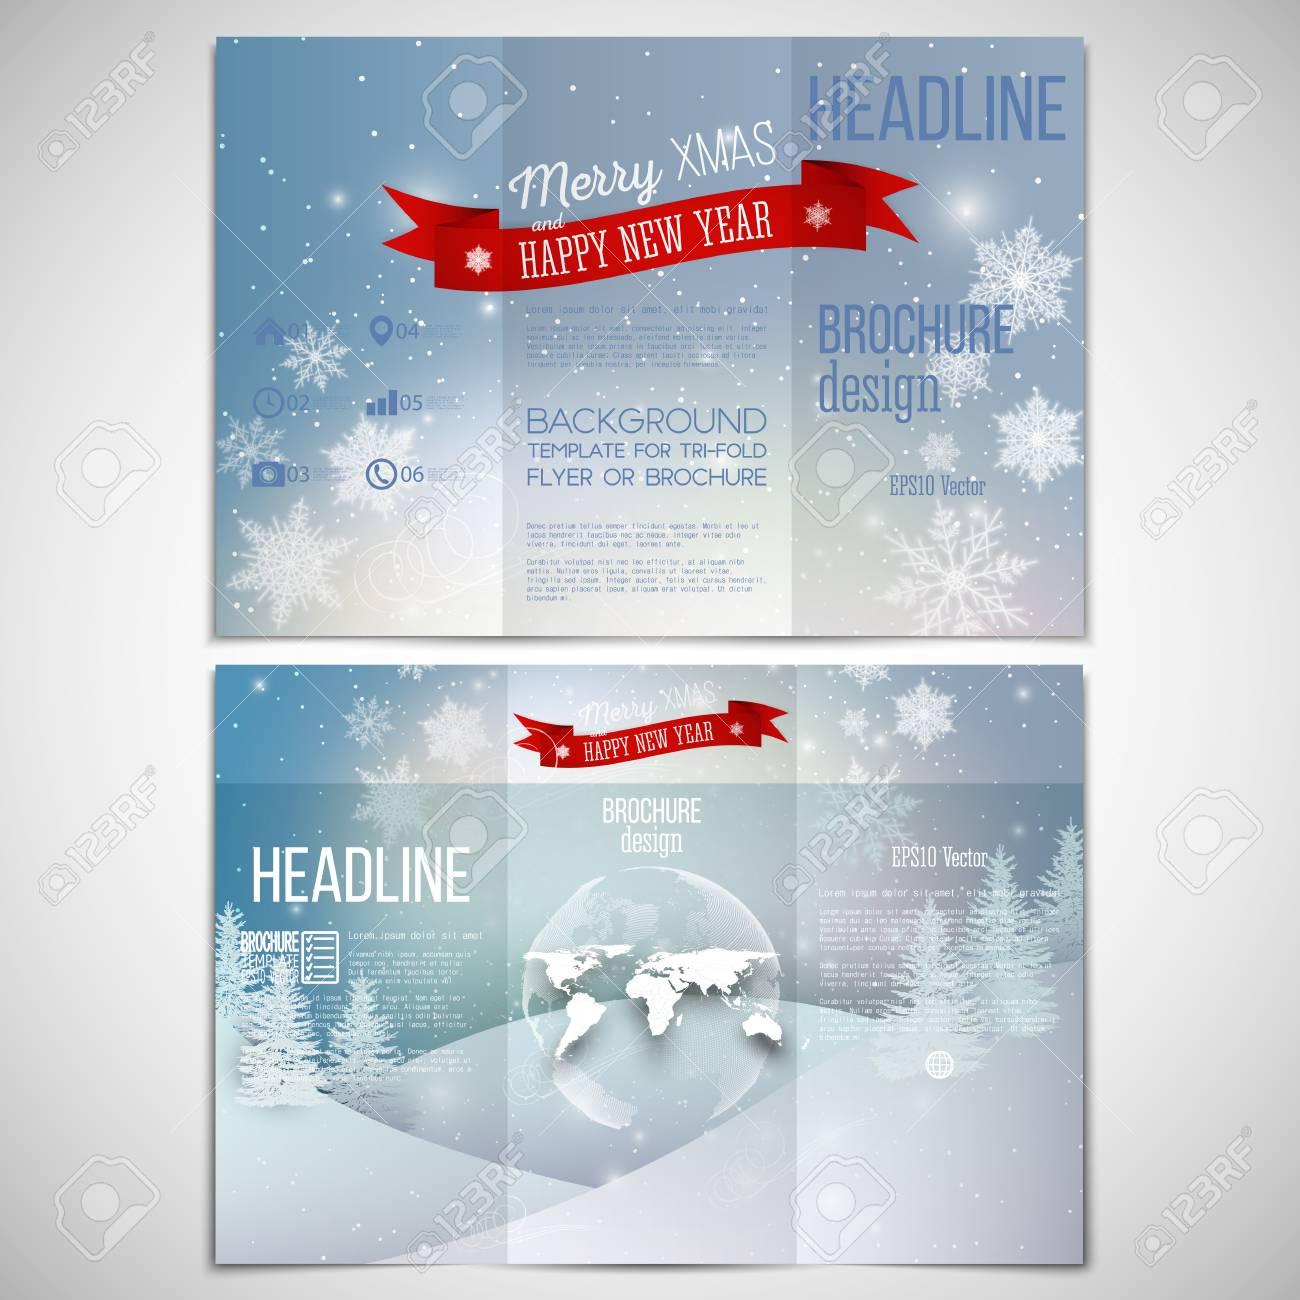 vector set of tri fold brochure design template on both sides